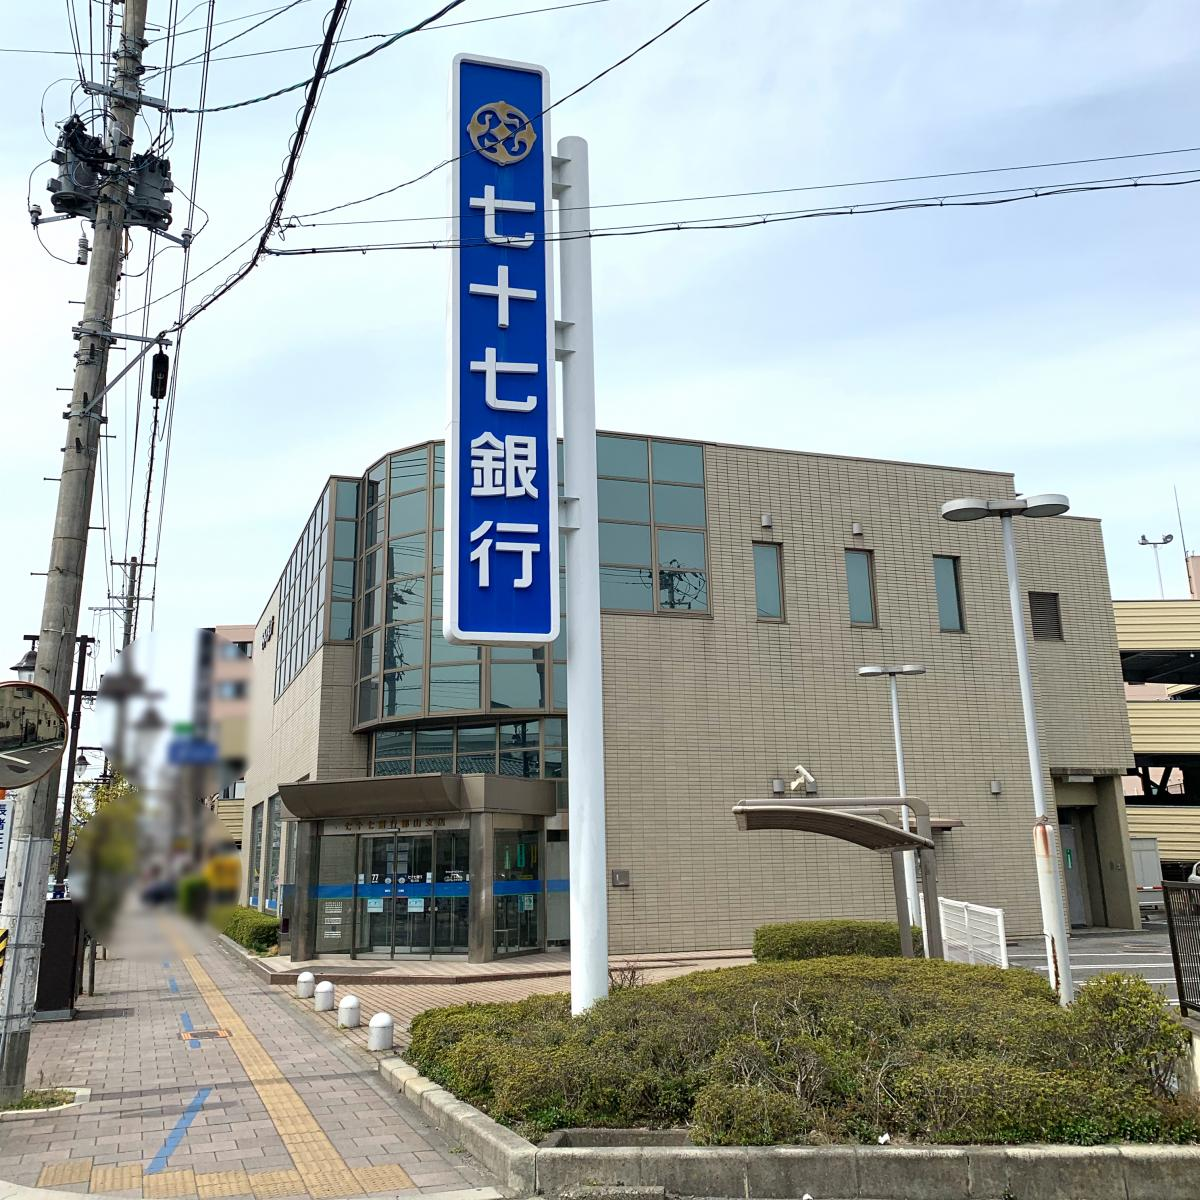 Atm 七 七 十 銀行 ATM提携